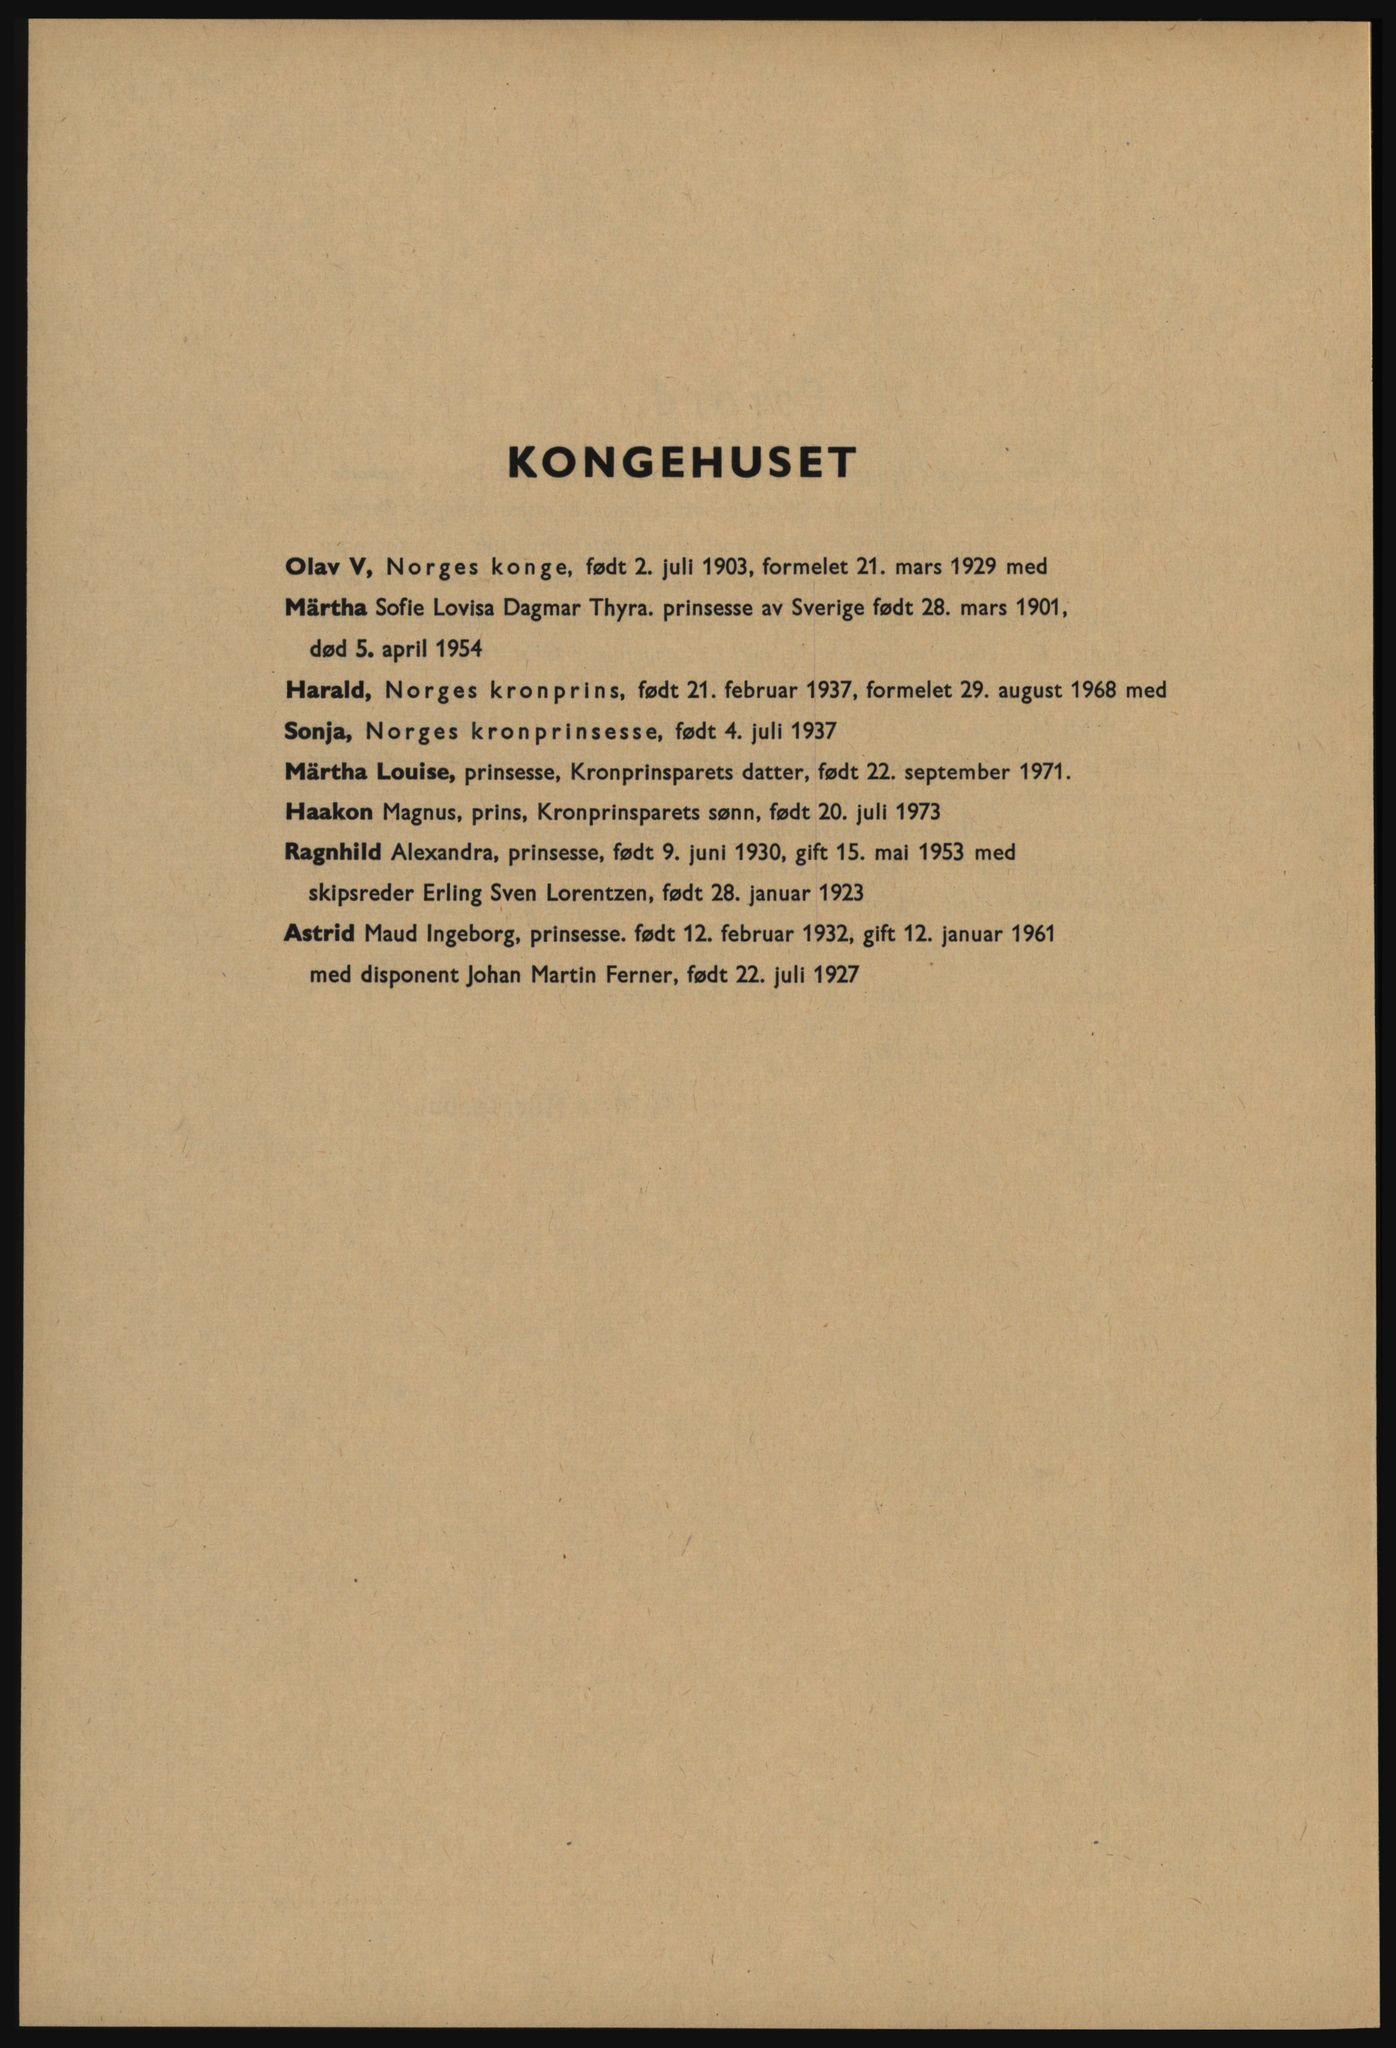 PUBL, Kristiania/Oslo adressebok, 1976-1977